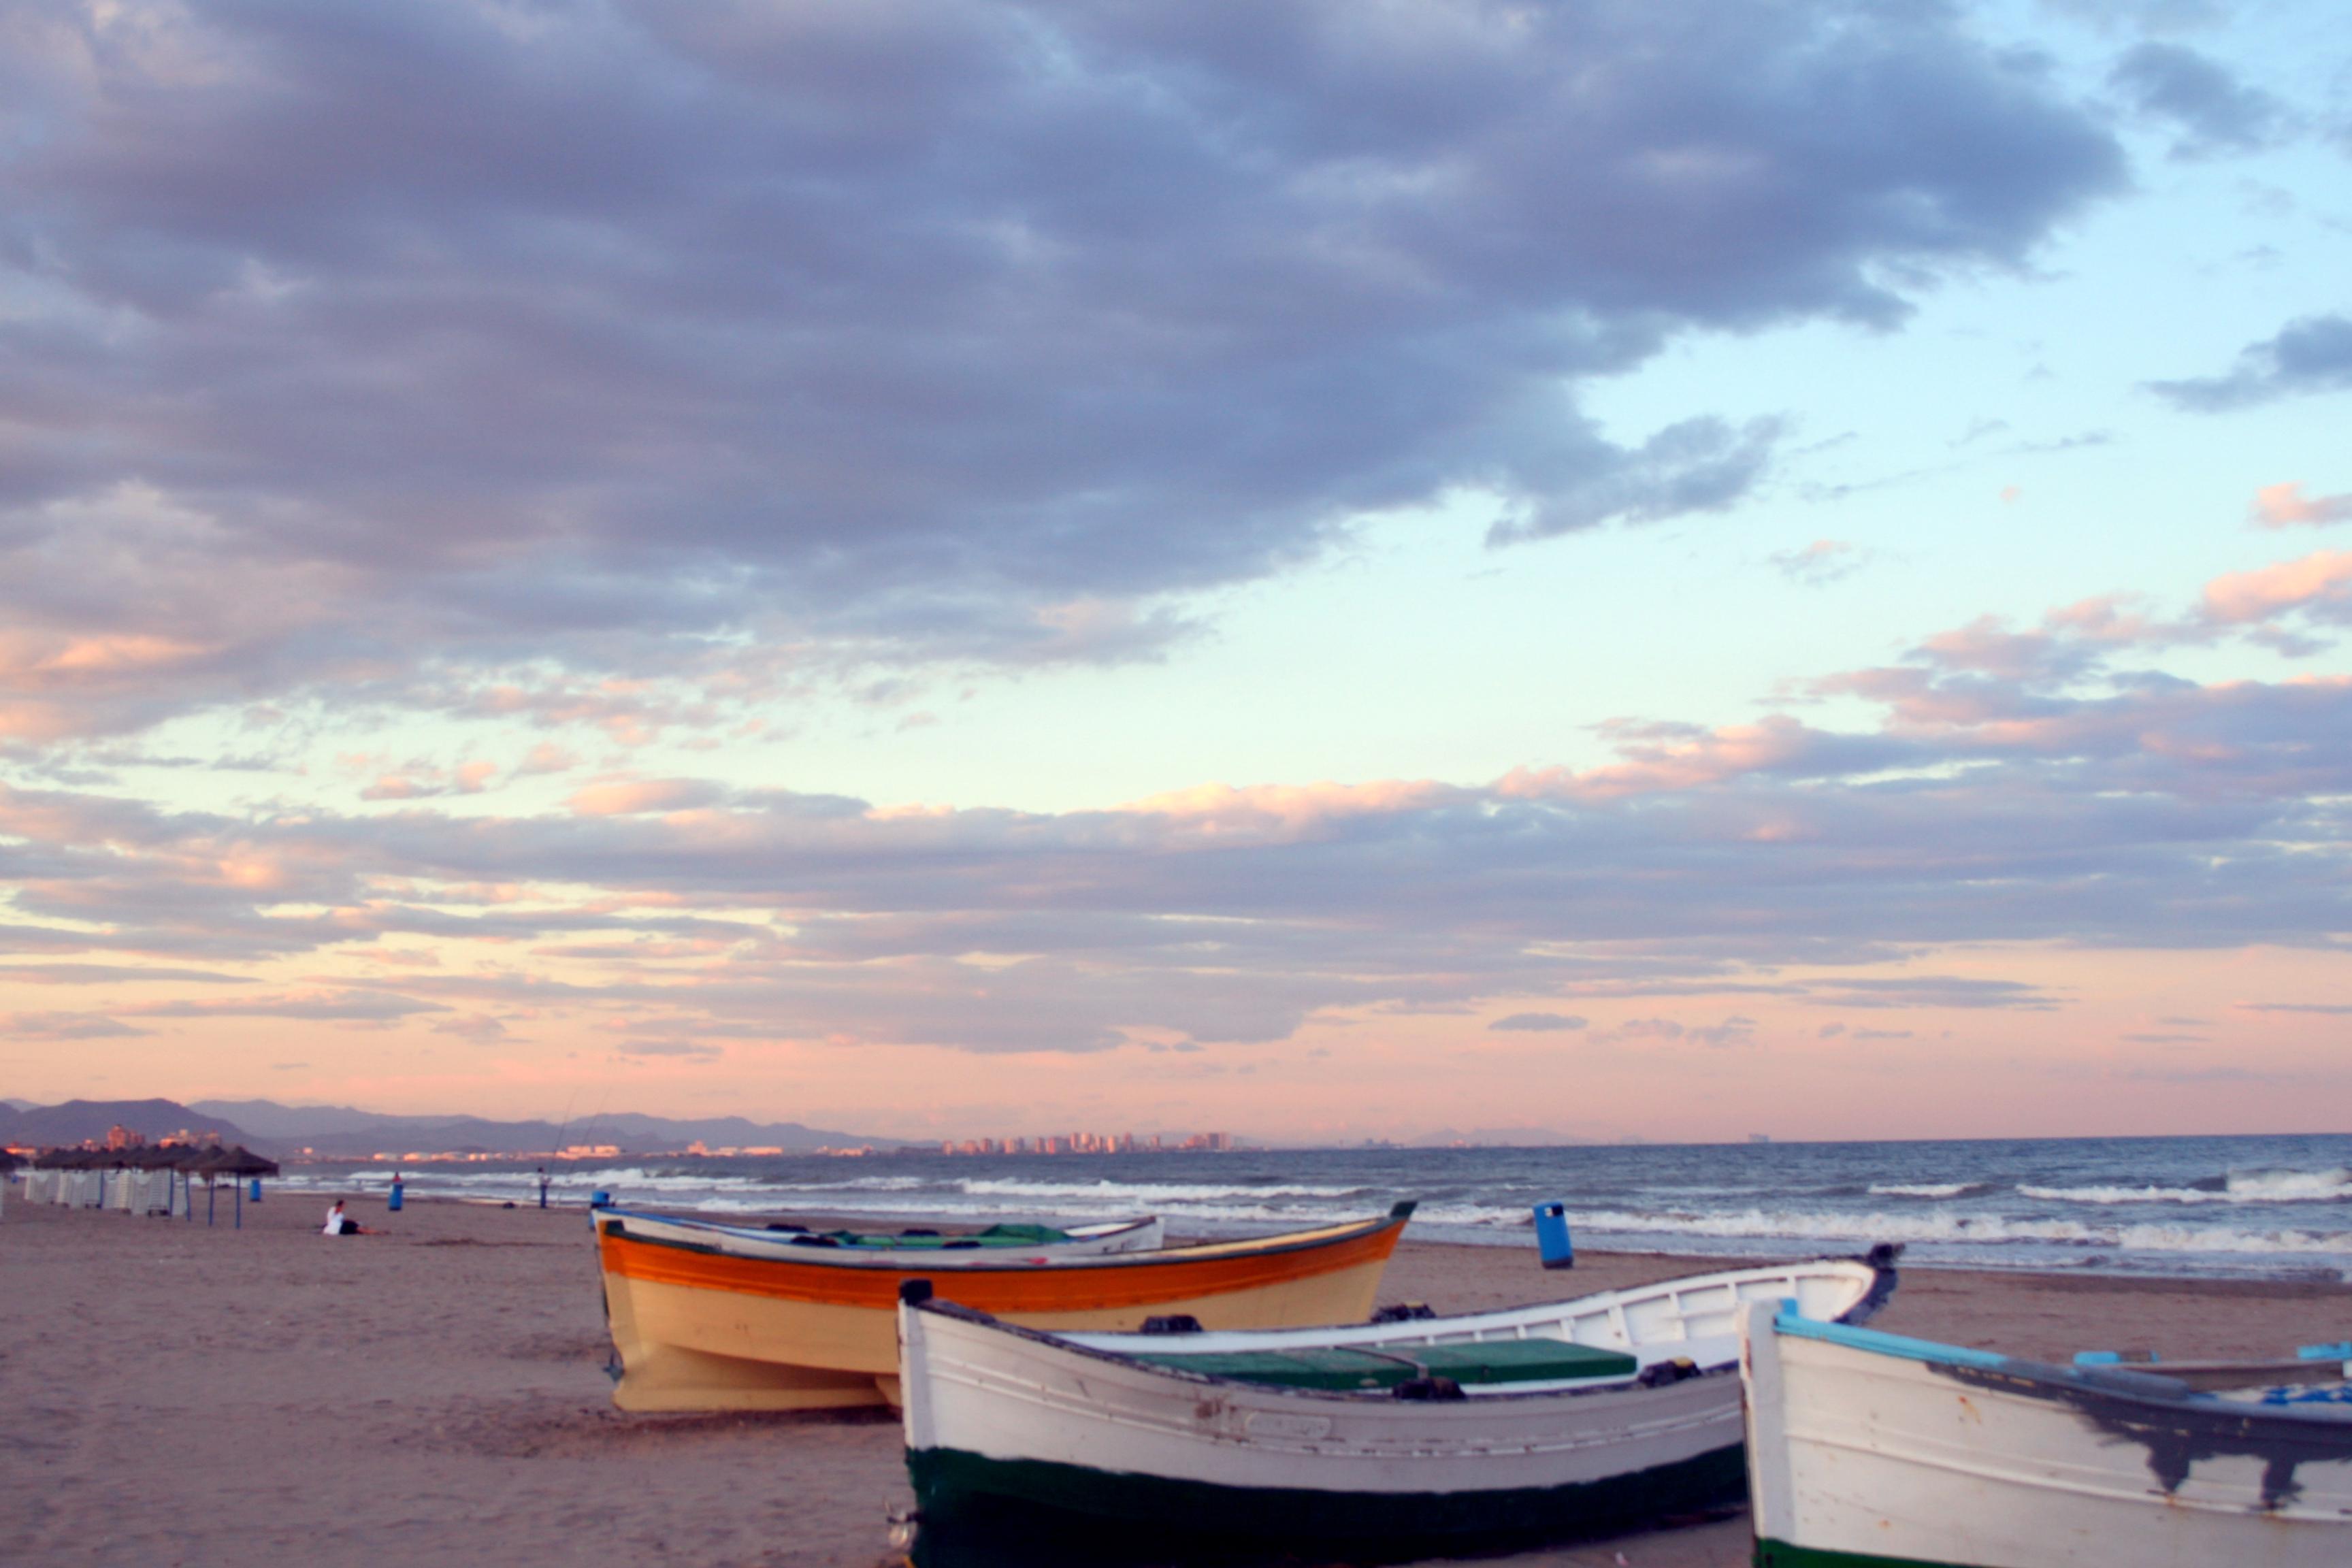 Playa de El Cabanyal (Valencia) 03.jpg